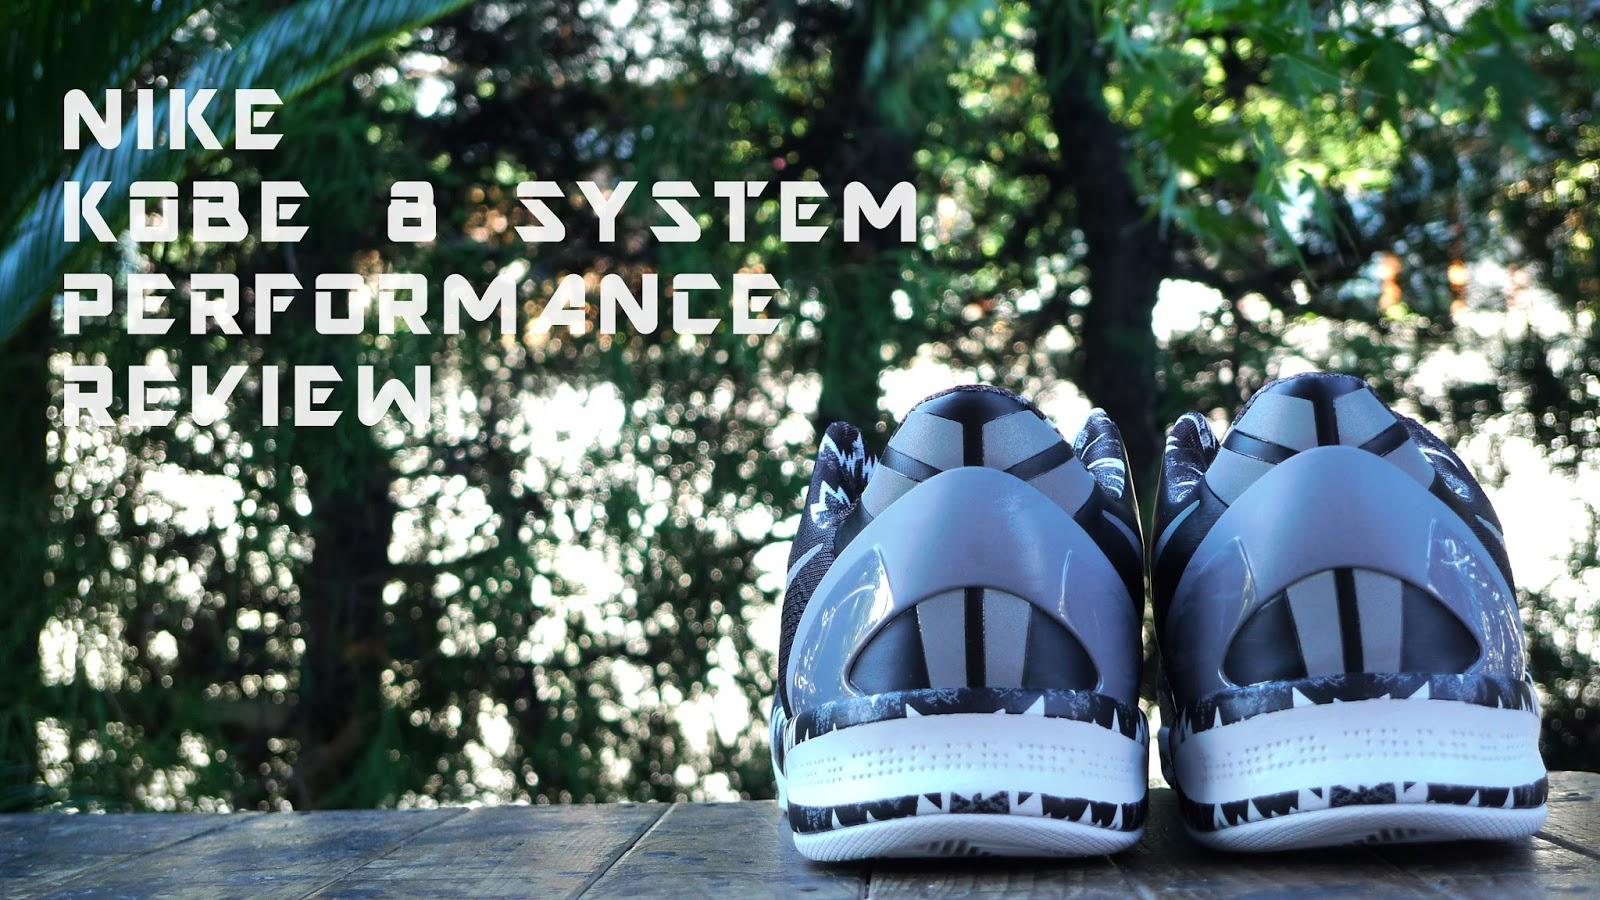 eda445bb259 Nike Kobe VIII (8) System Performance Review - SZOK